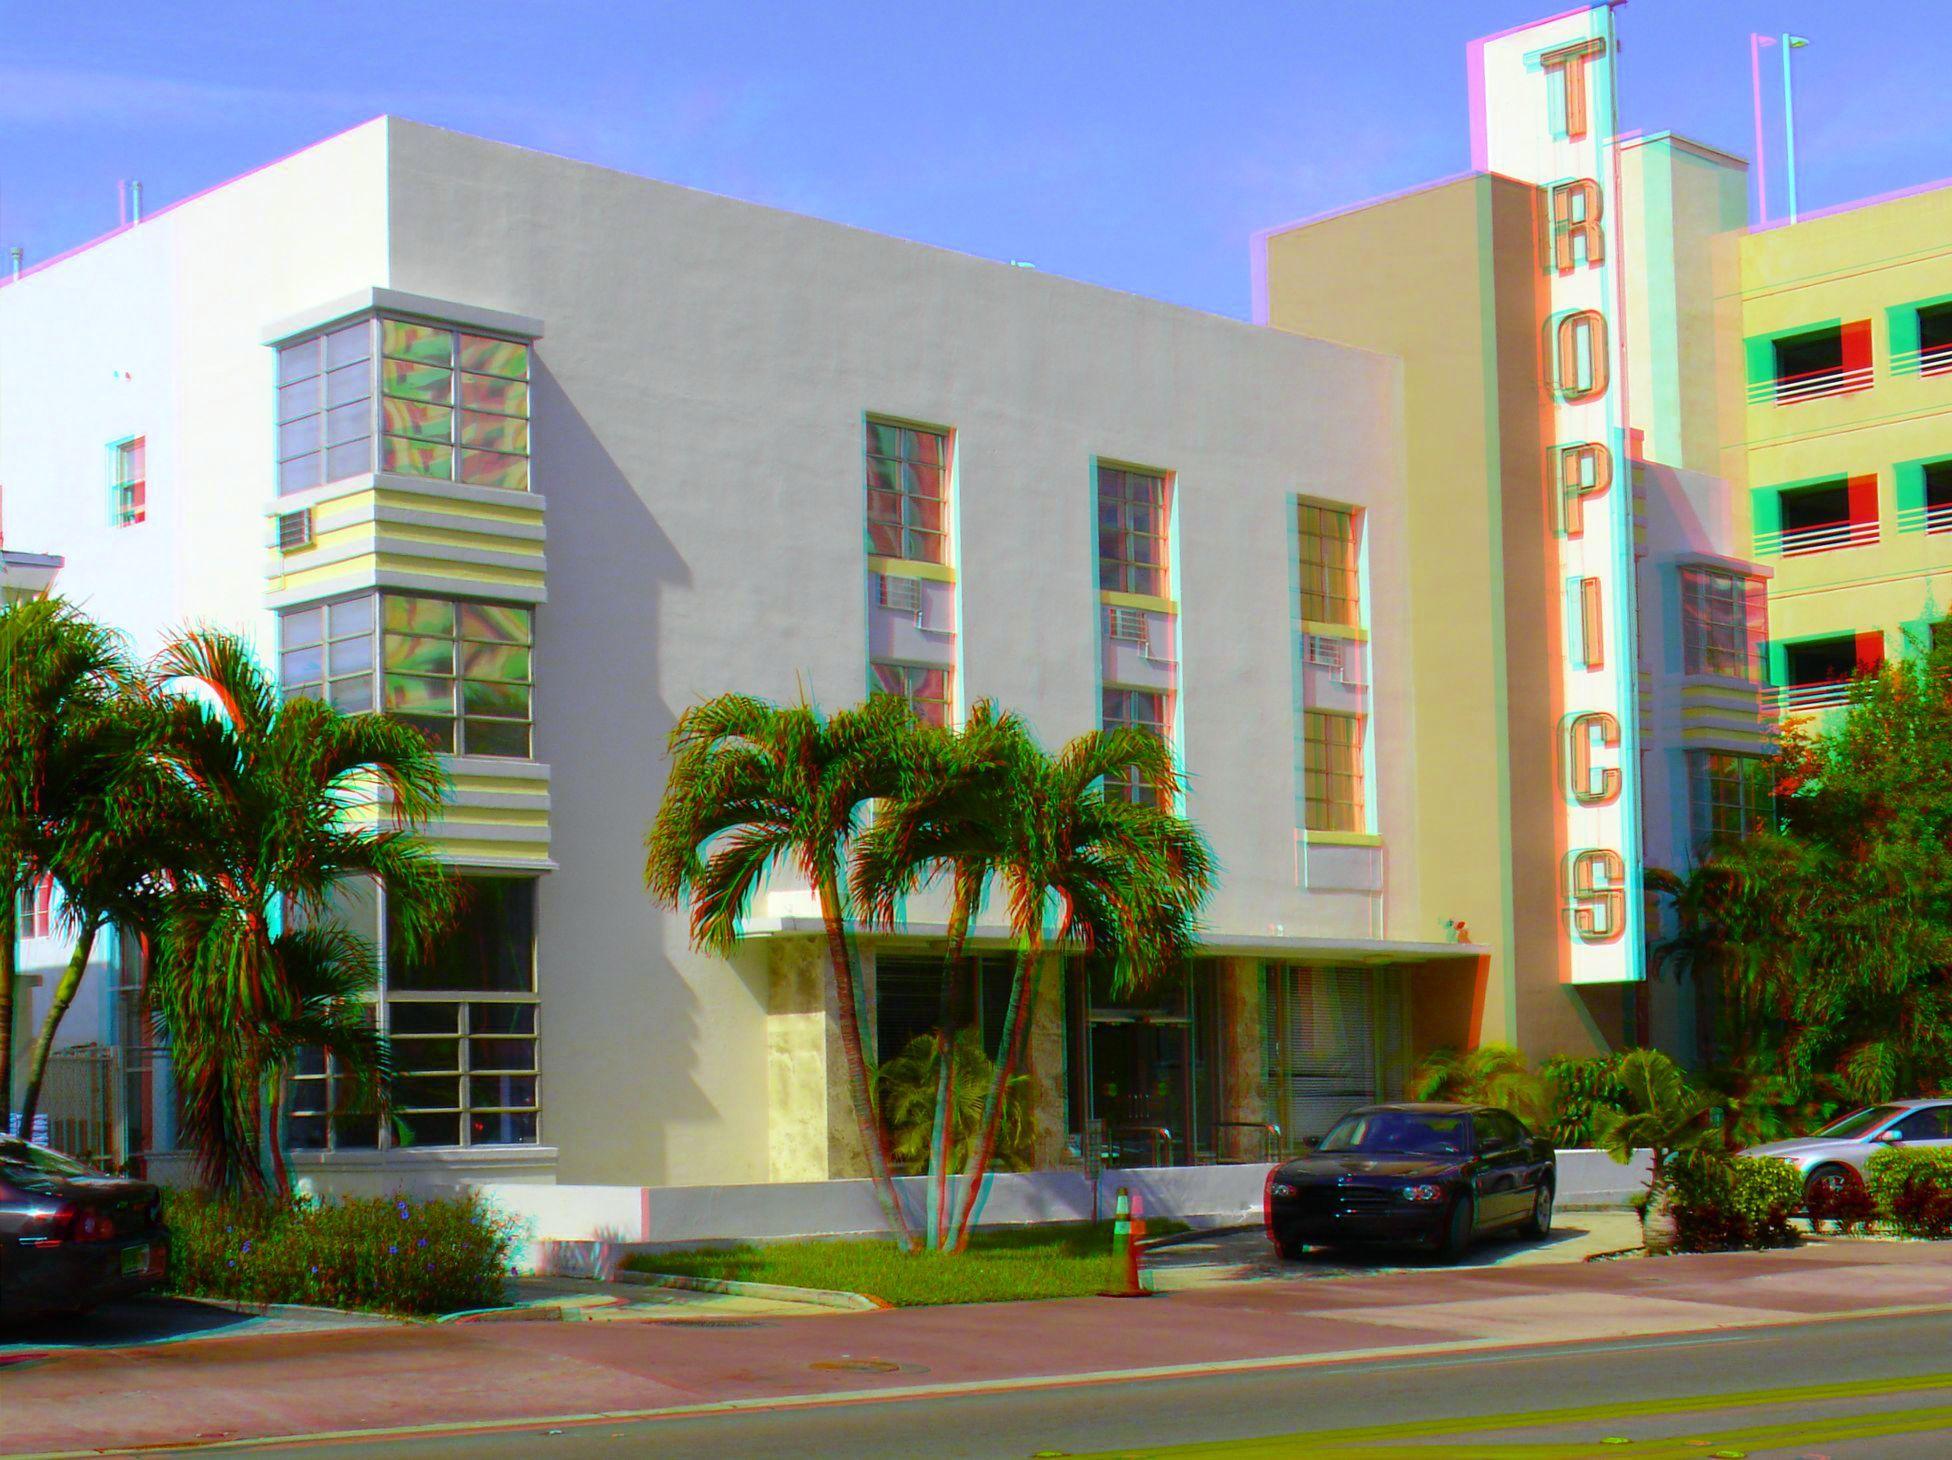 1550 Collins Avenue The Tropics Hotel Built 1939 Architect Donald G Smith Style Art Deco